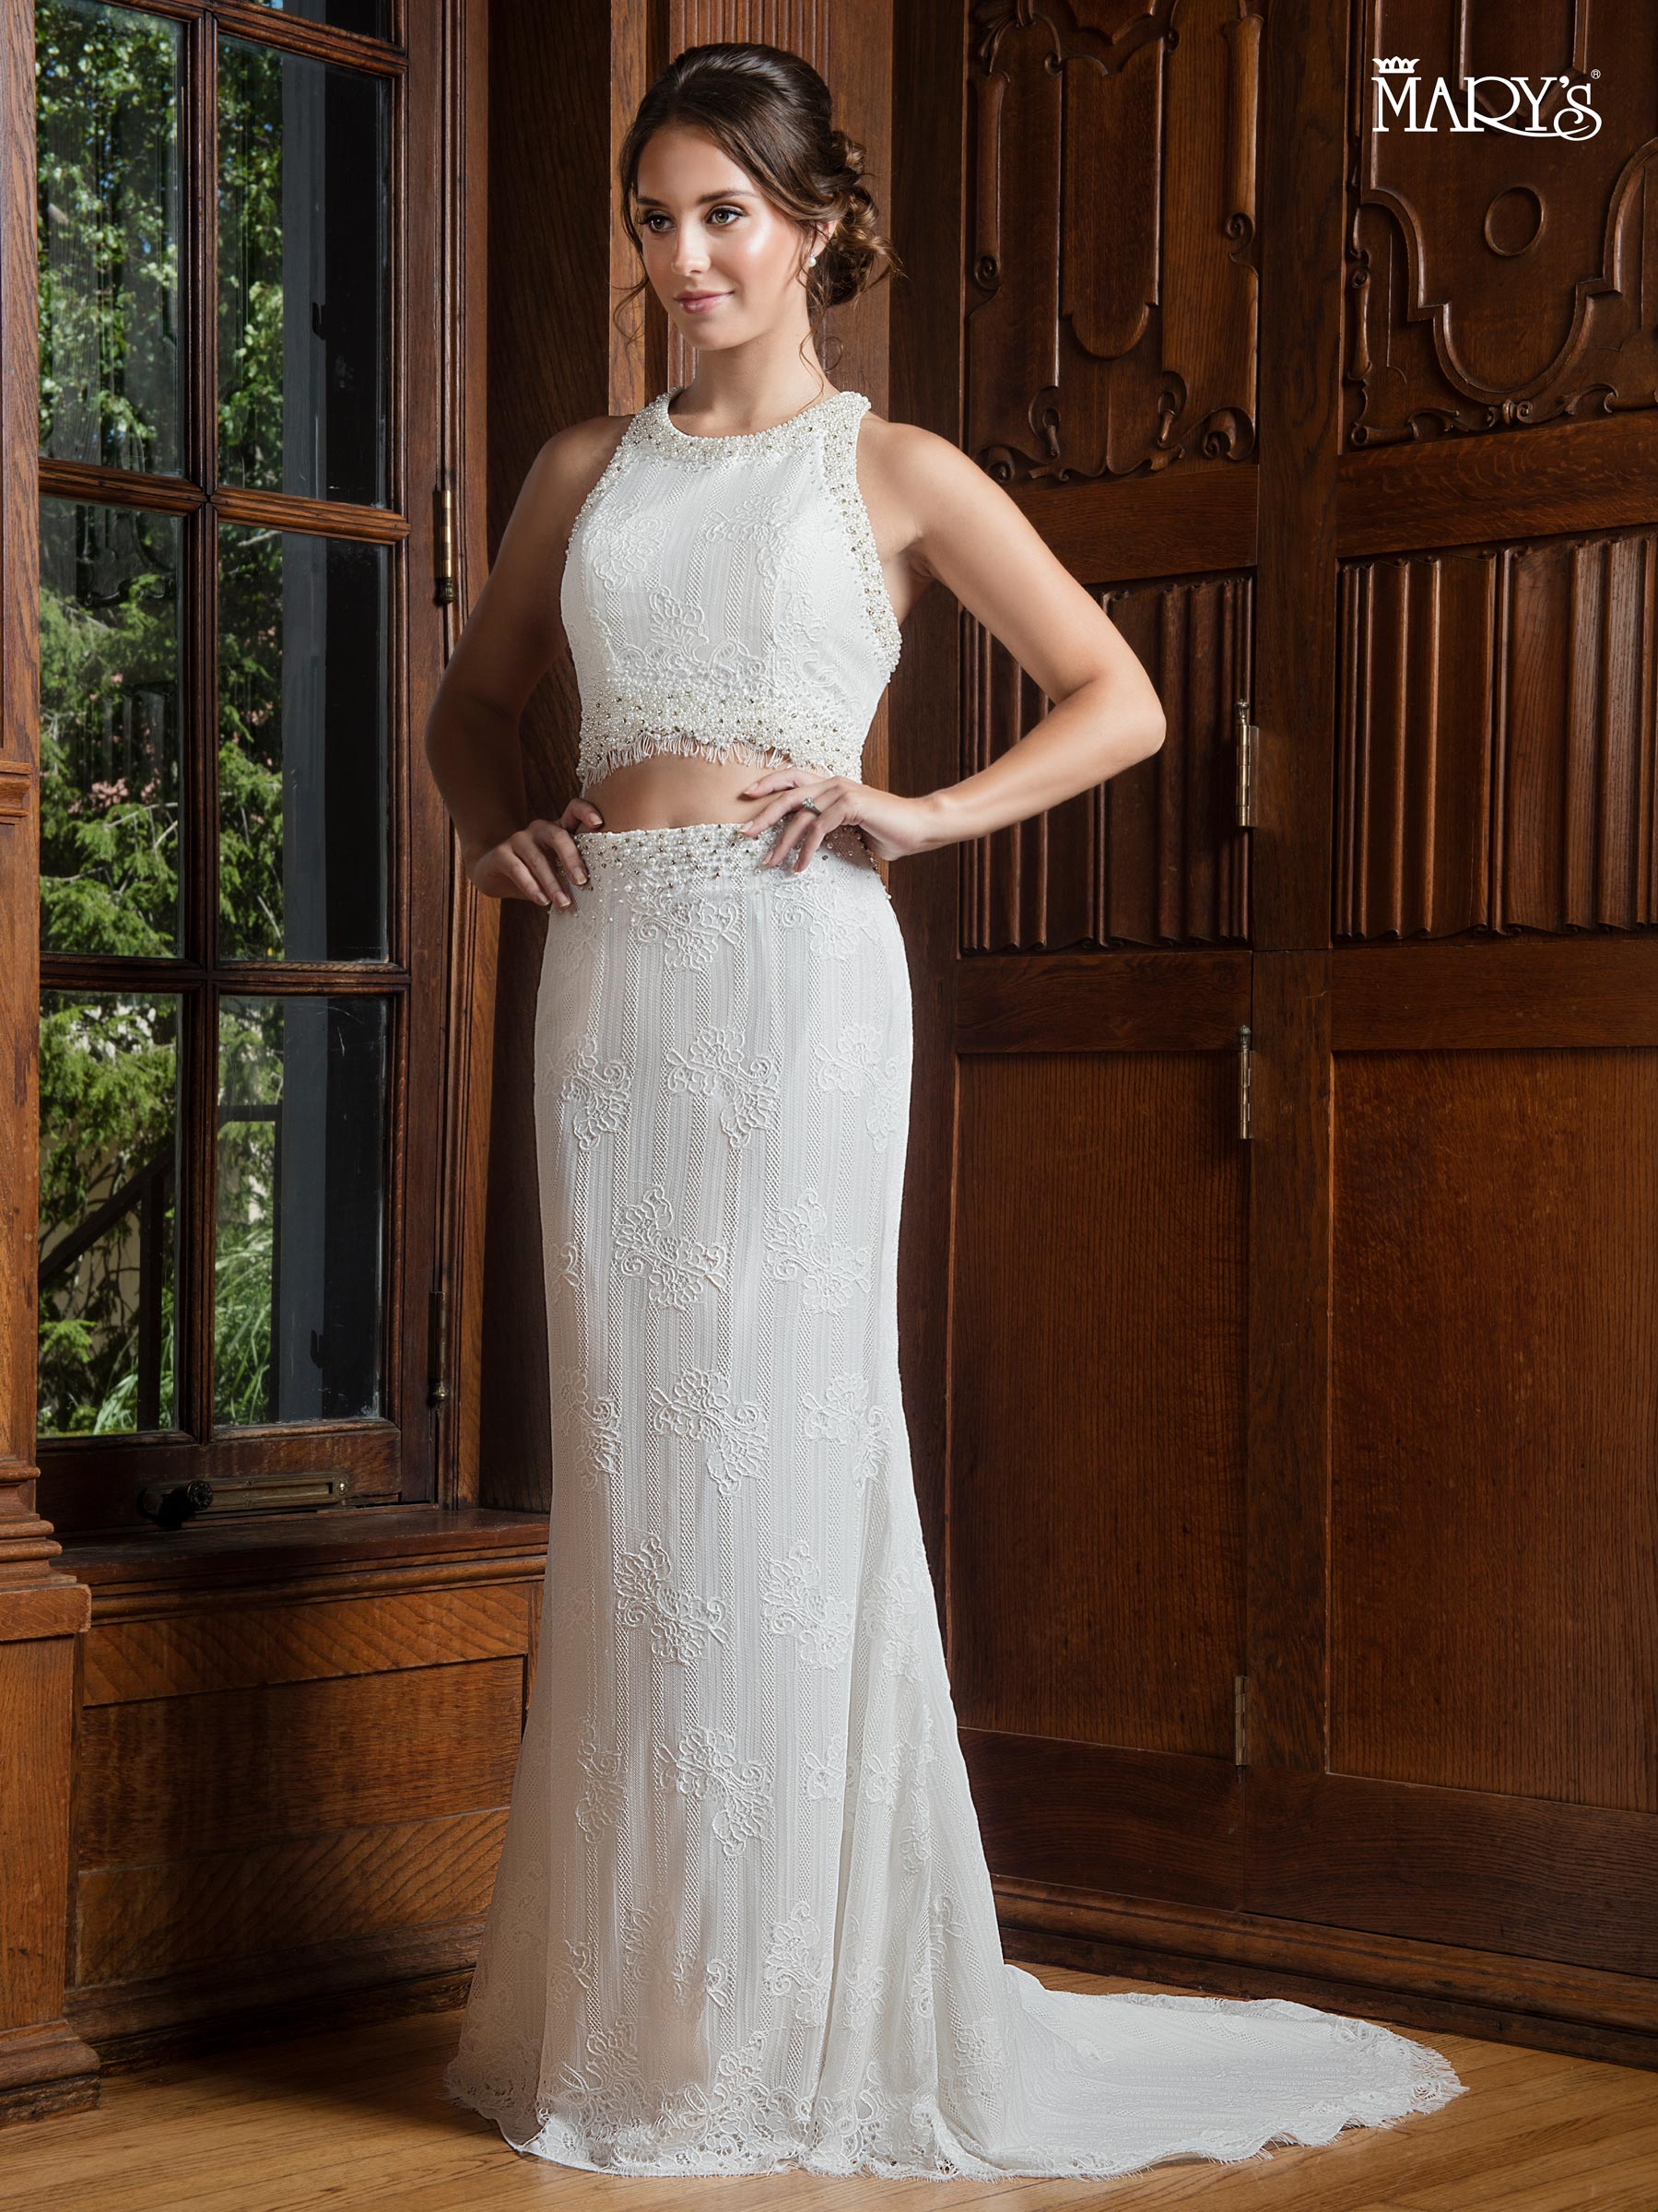 Bridal Wedding Dresses | Mary's | Style - MB1001